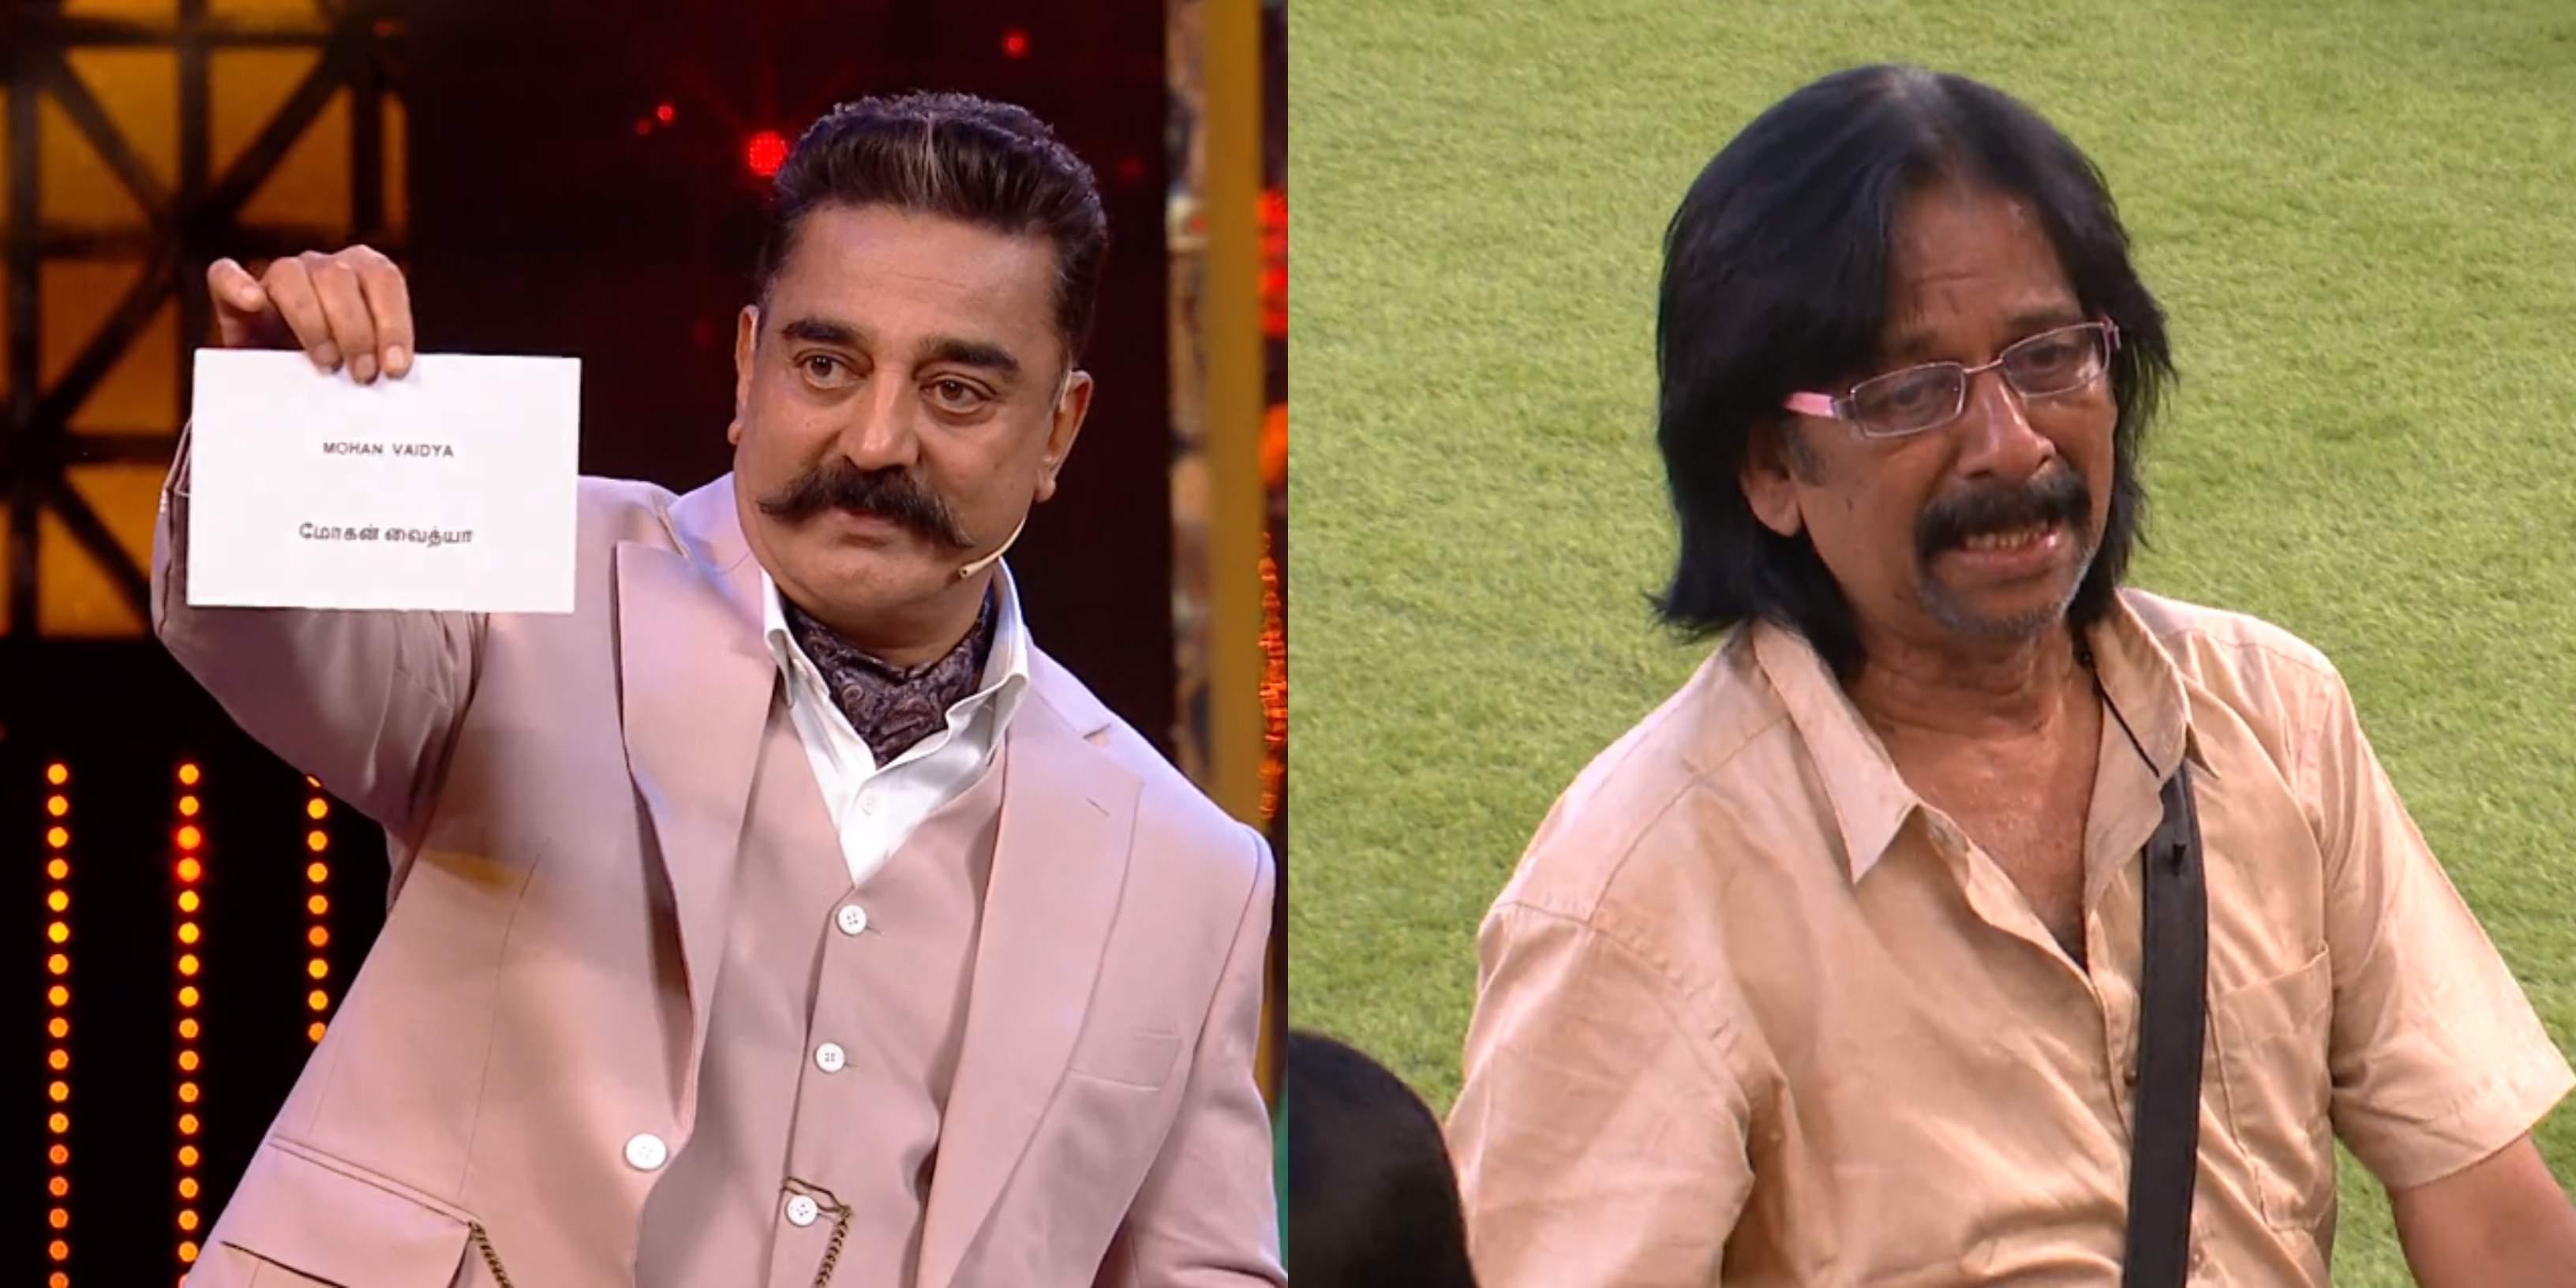 Bigg Boss Tamil 3: Day 28 Episode 29: The housemates say